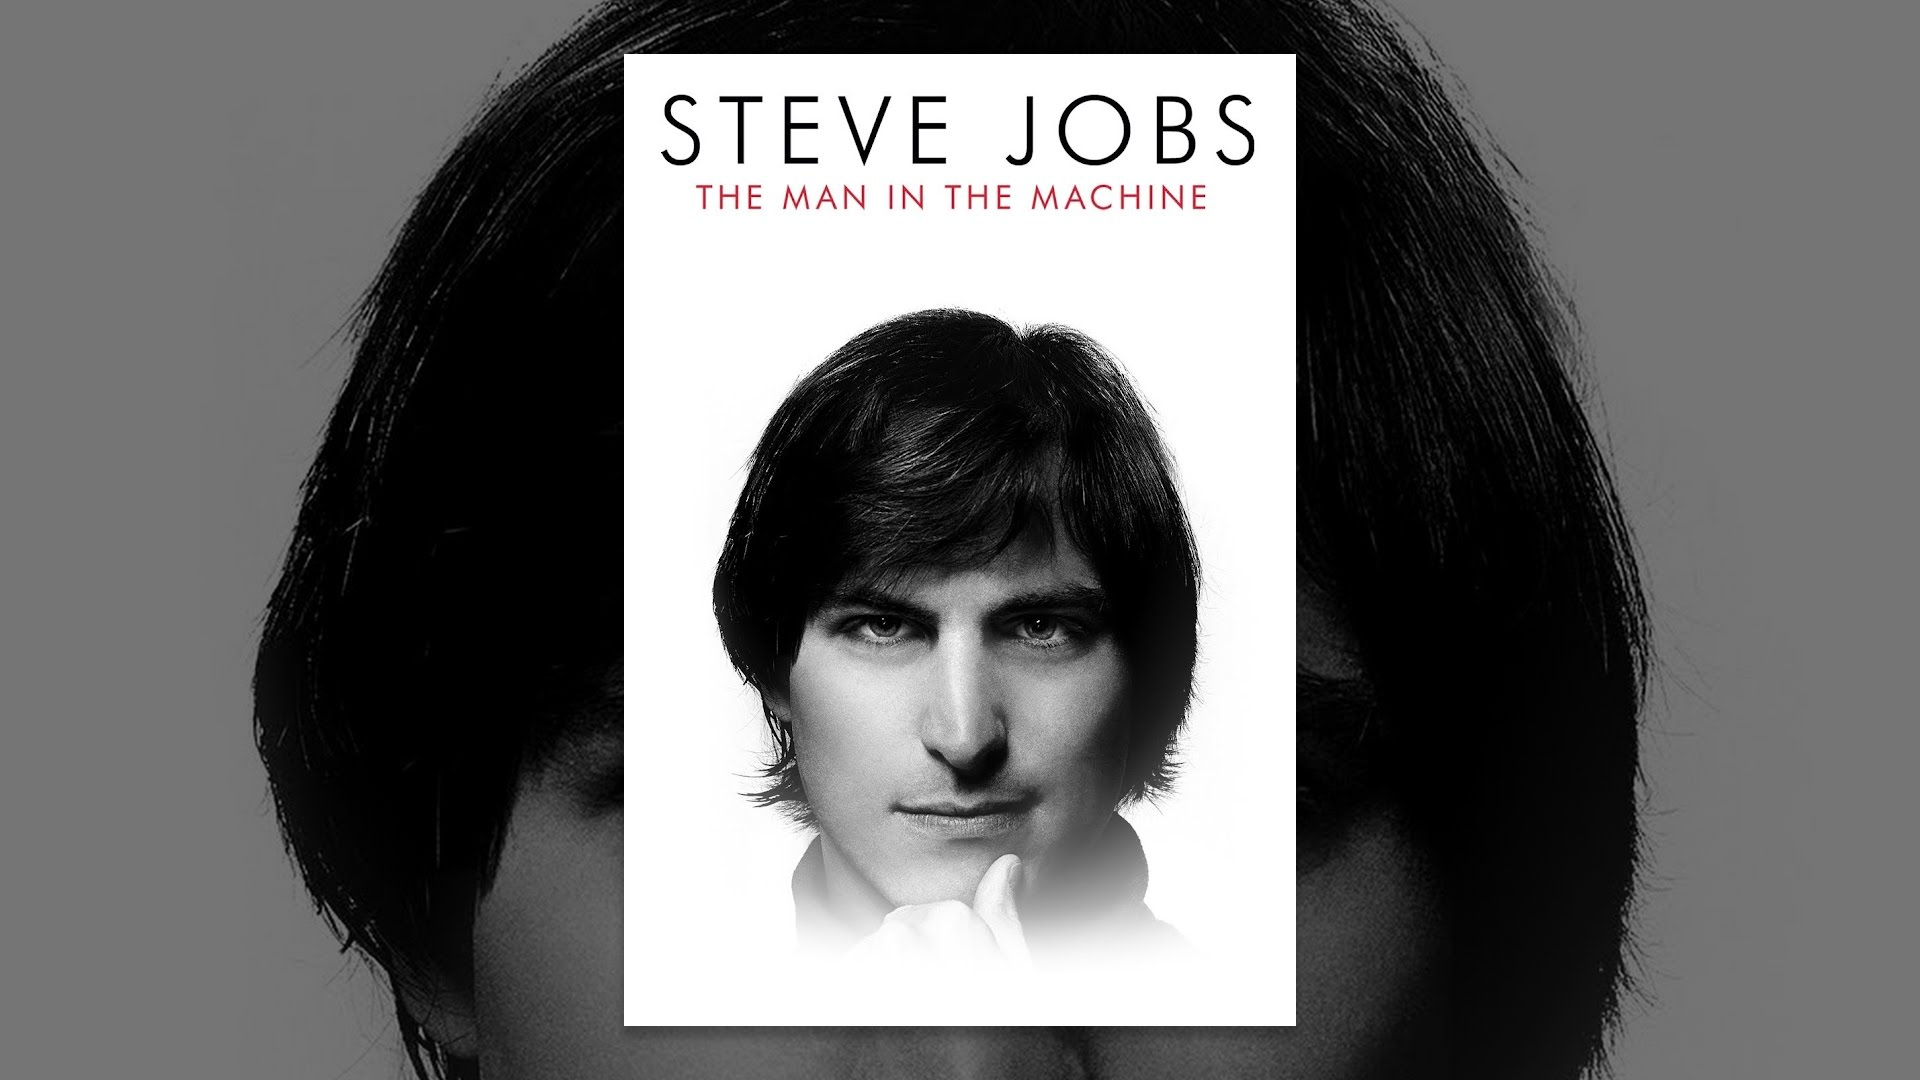 Steve jobs movie dvd release date in Australia